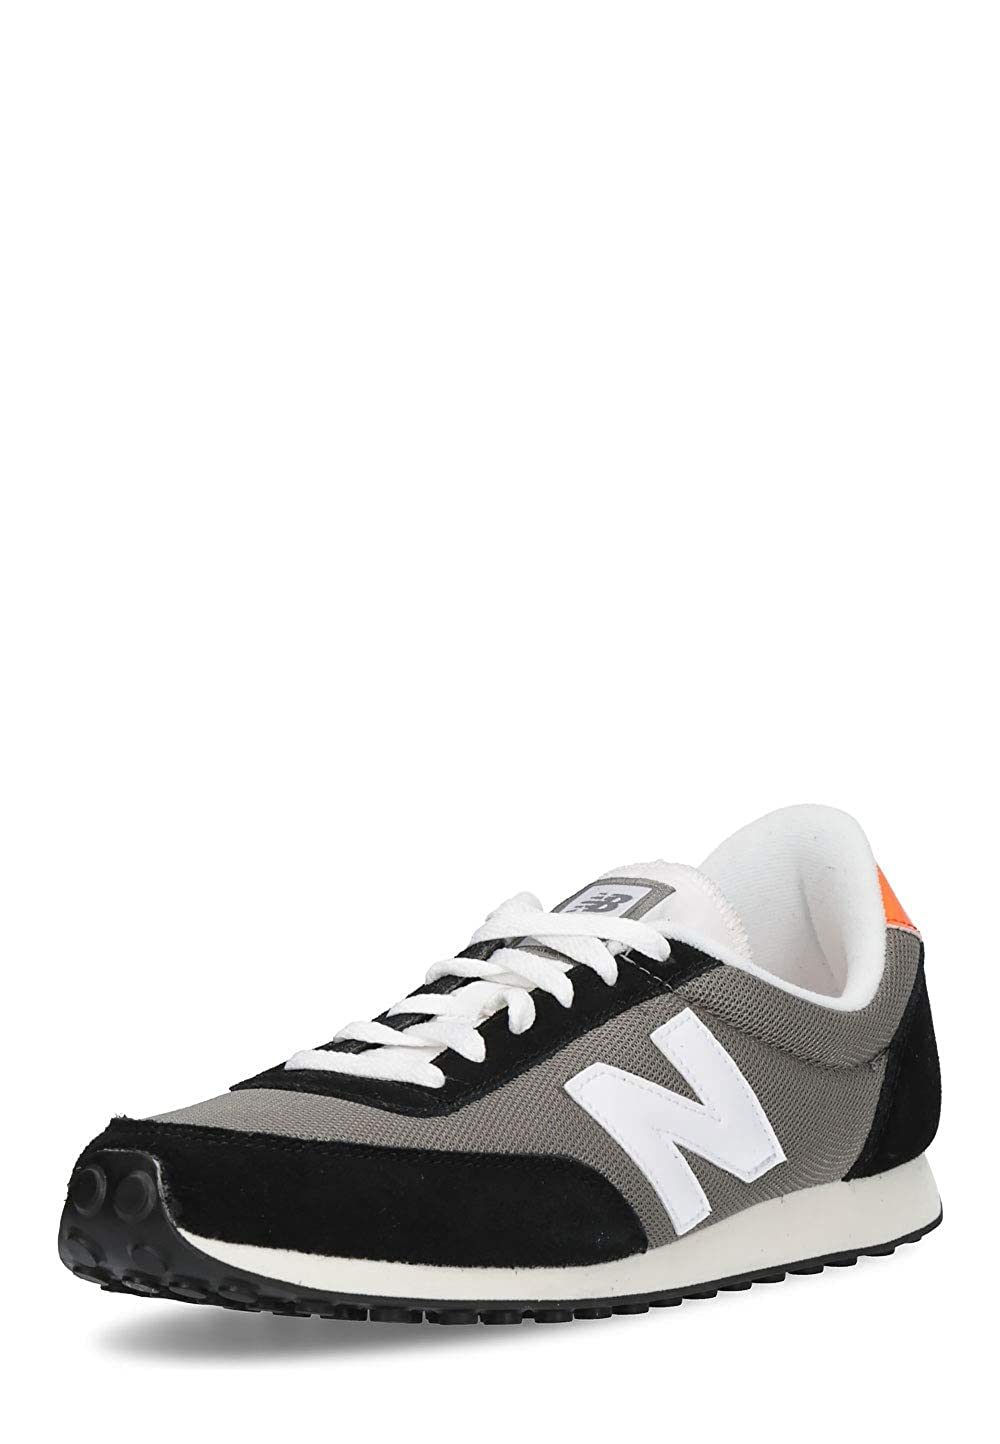 New Balance Women's 410 Trainers: Amazon.co.uk: Shoes & Bags